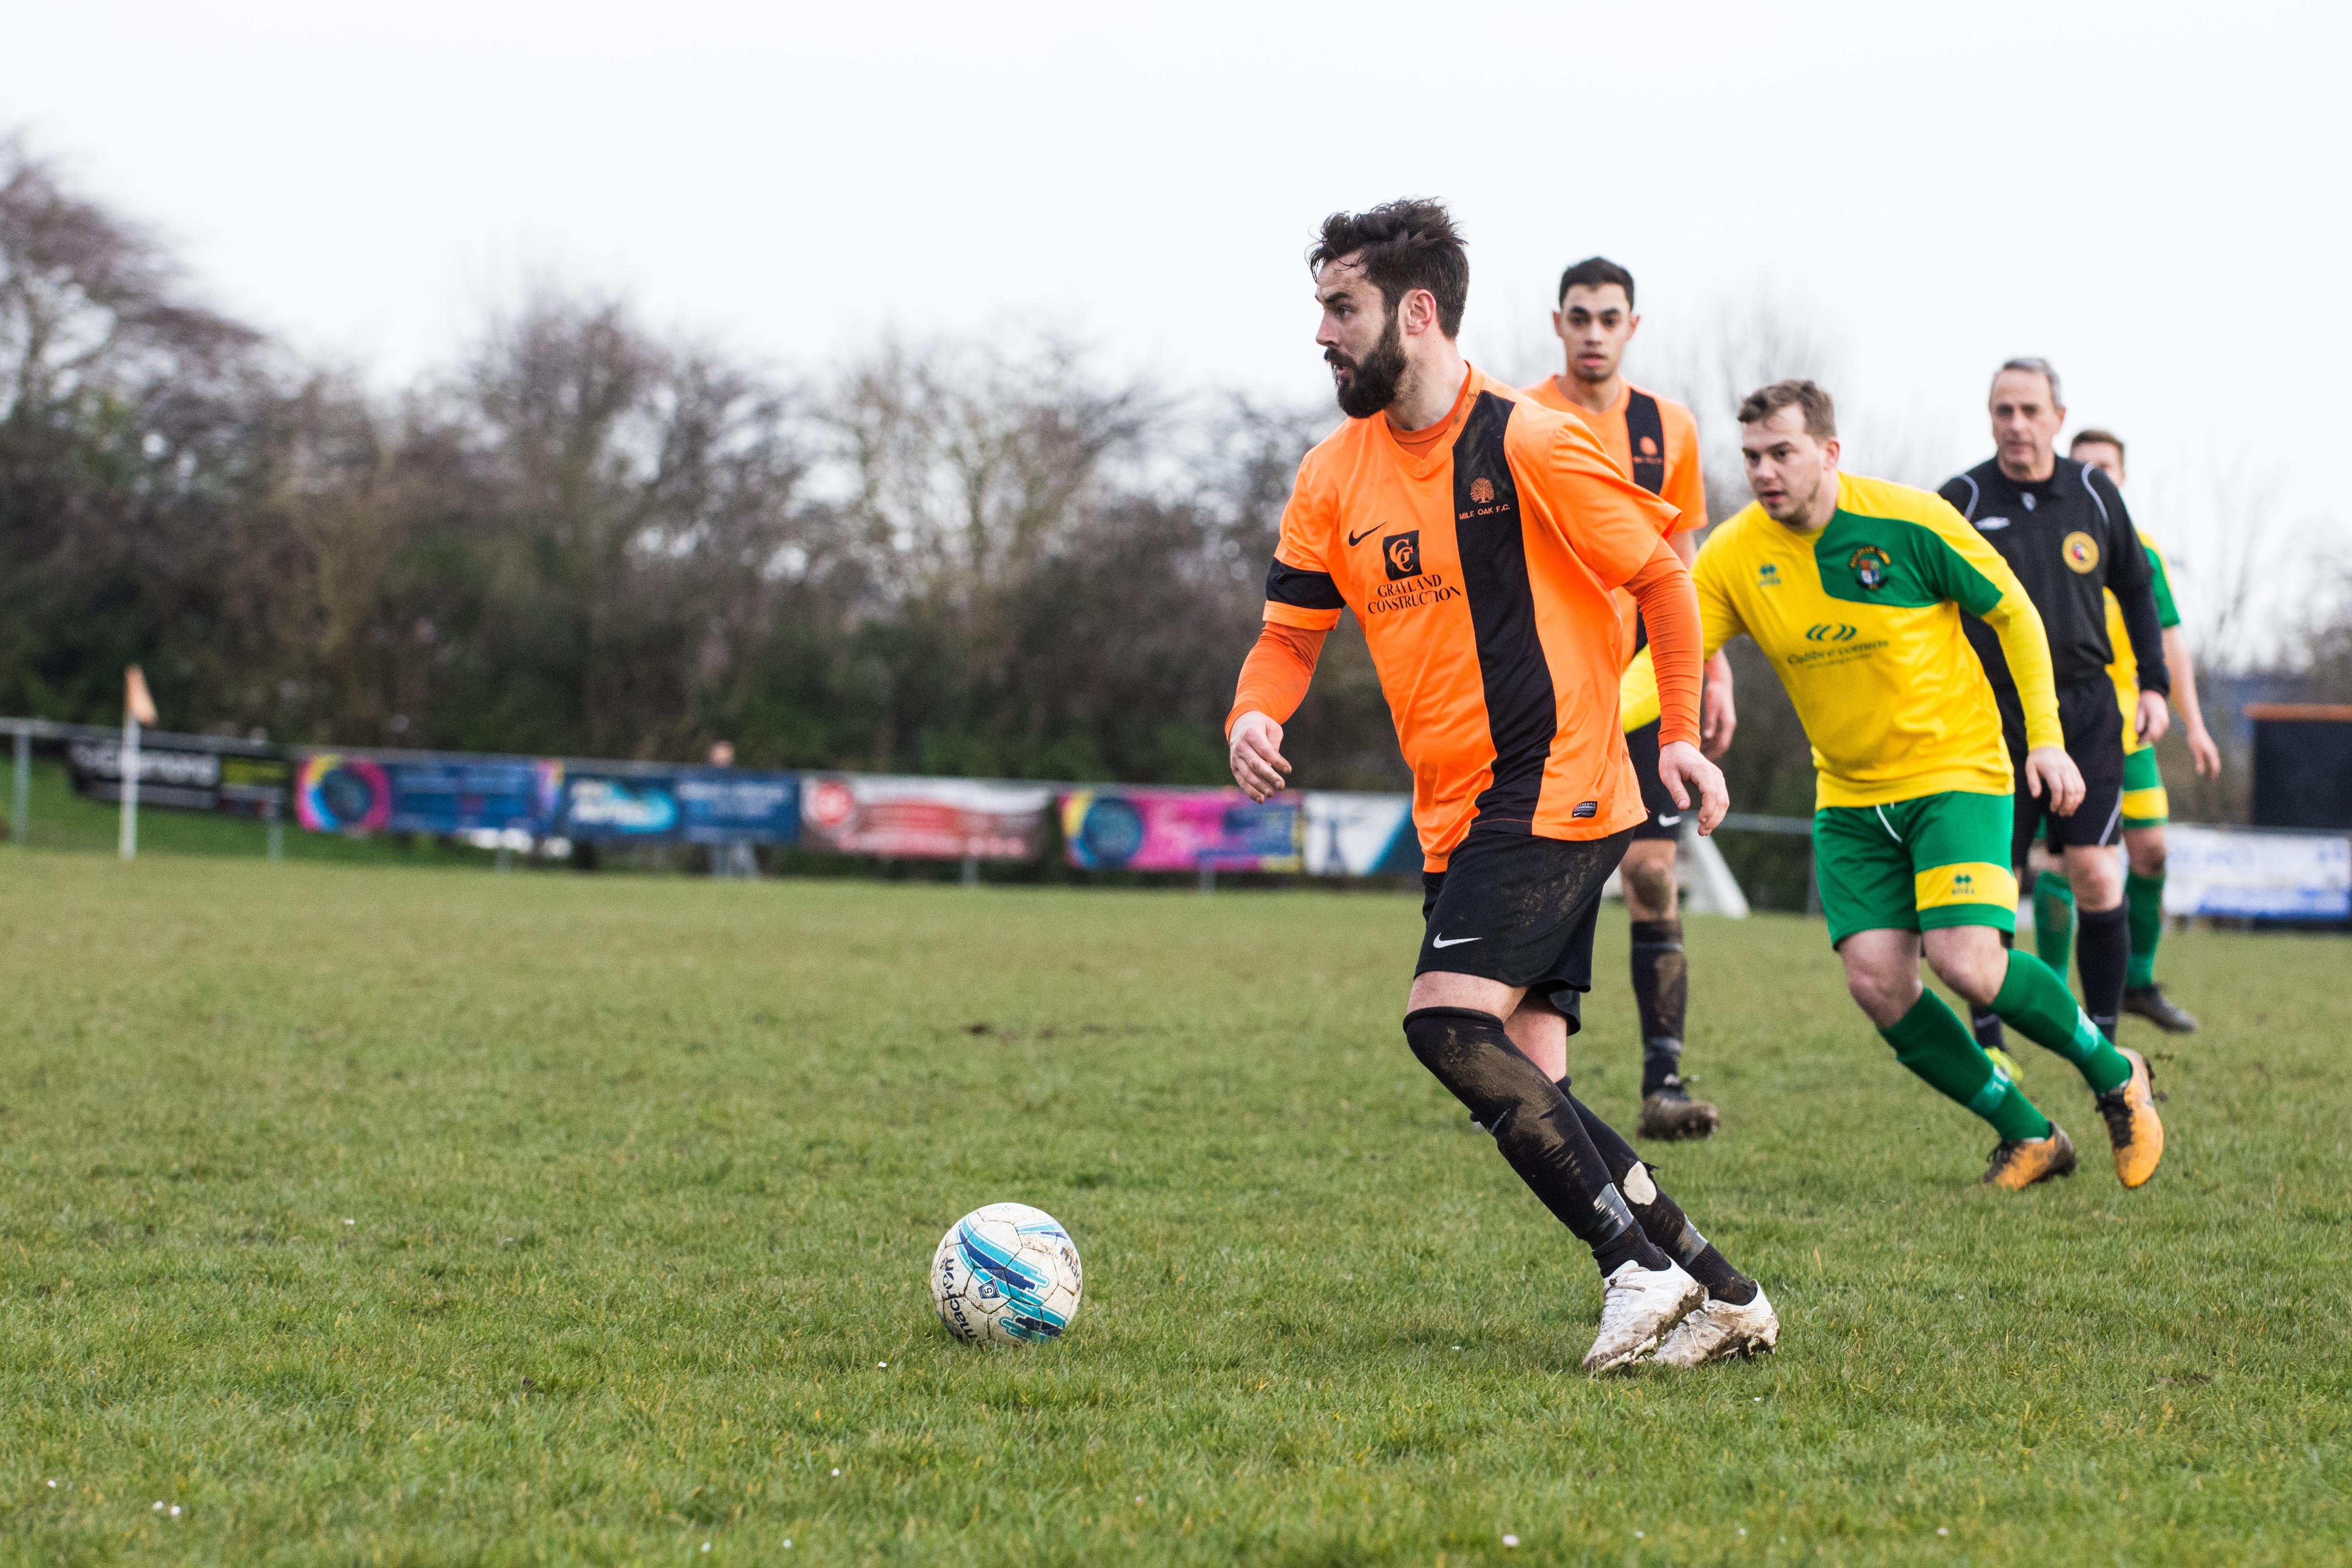 DAVID_JEFFERY Mile Oak FC vs Hailsham Town FC 24.03.18 85